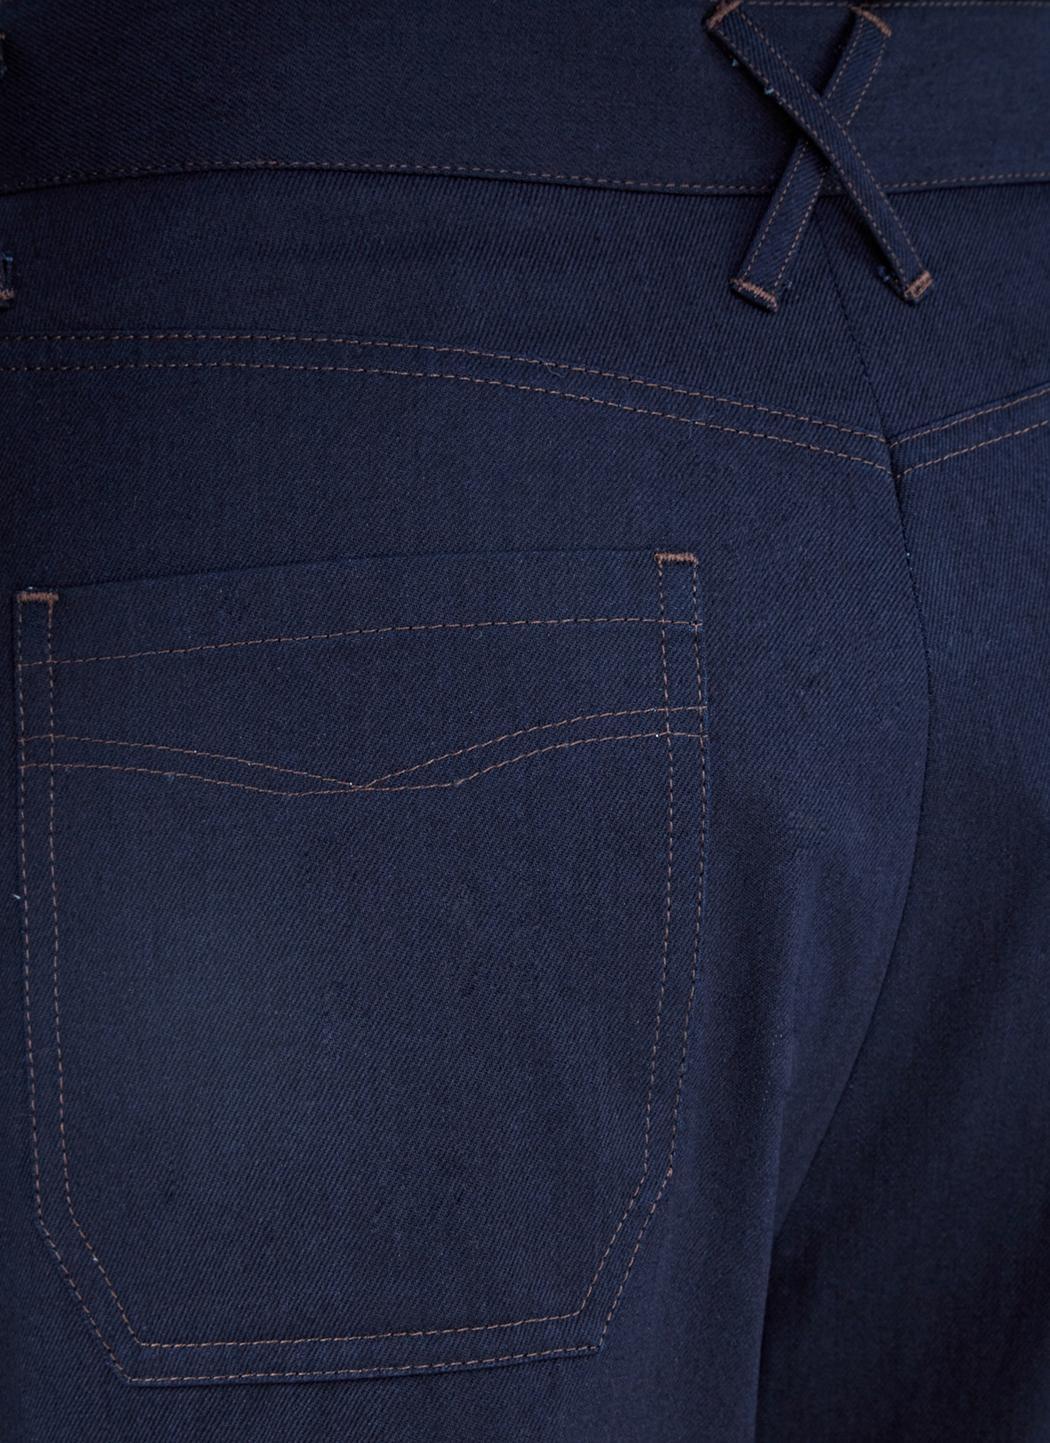 Wales Bonner Denim Men's Isaac Wide Leg Flared Jeans In Indigo in Blue for Men